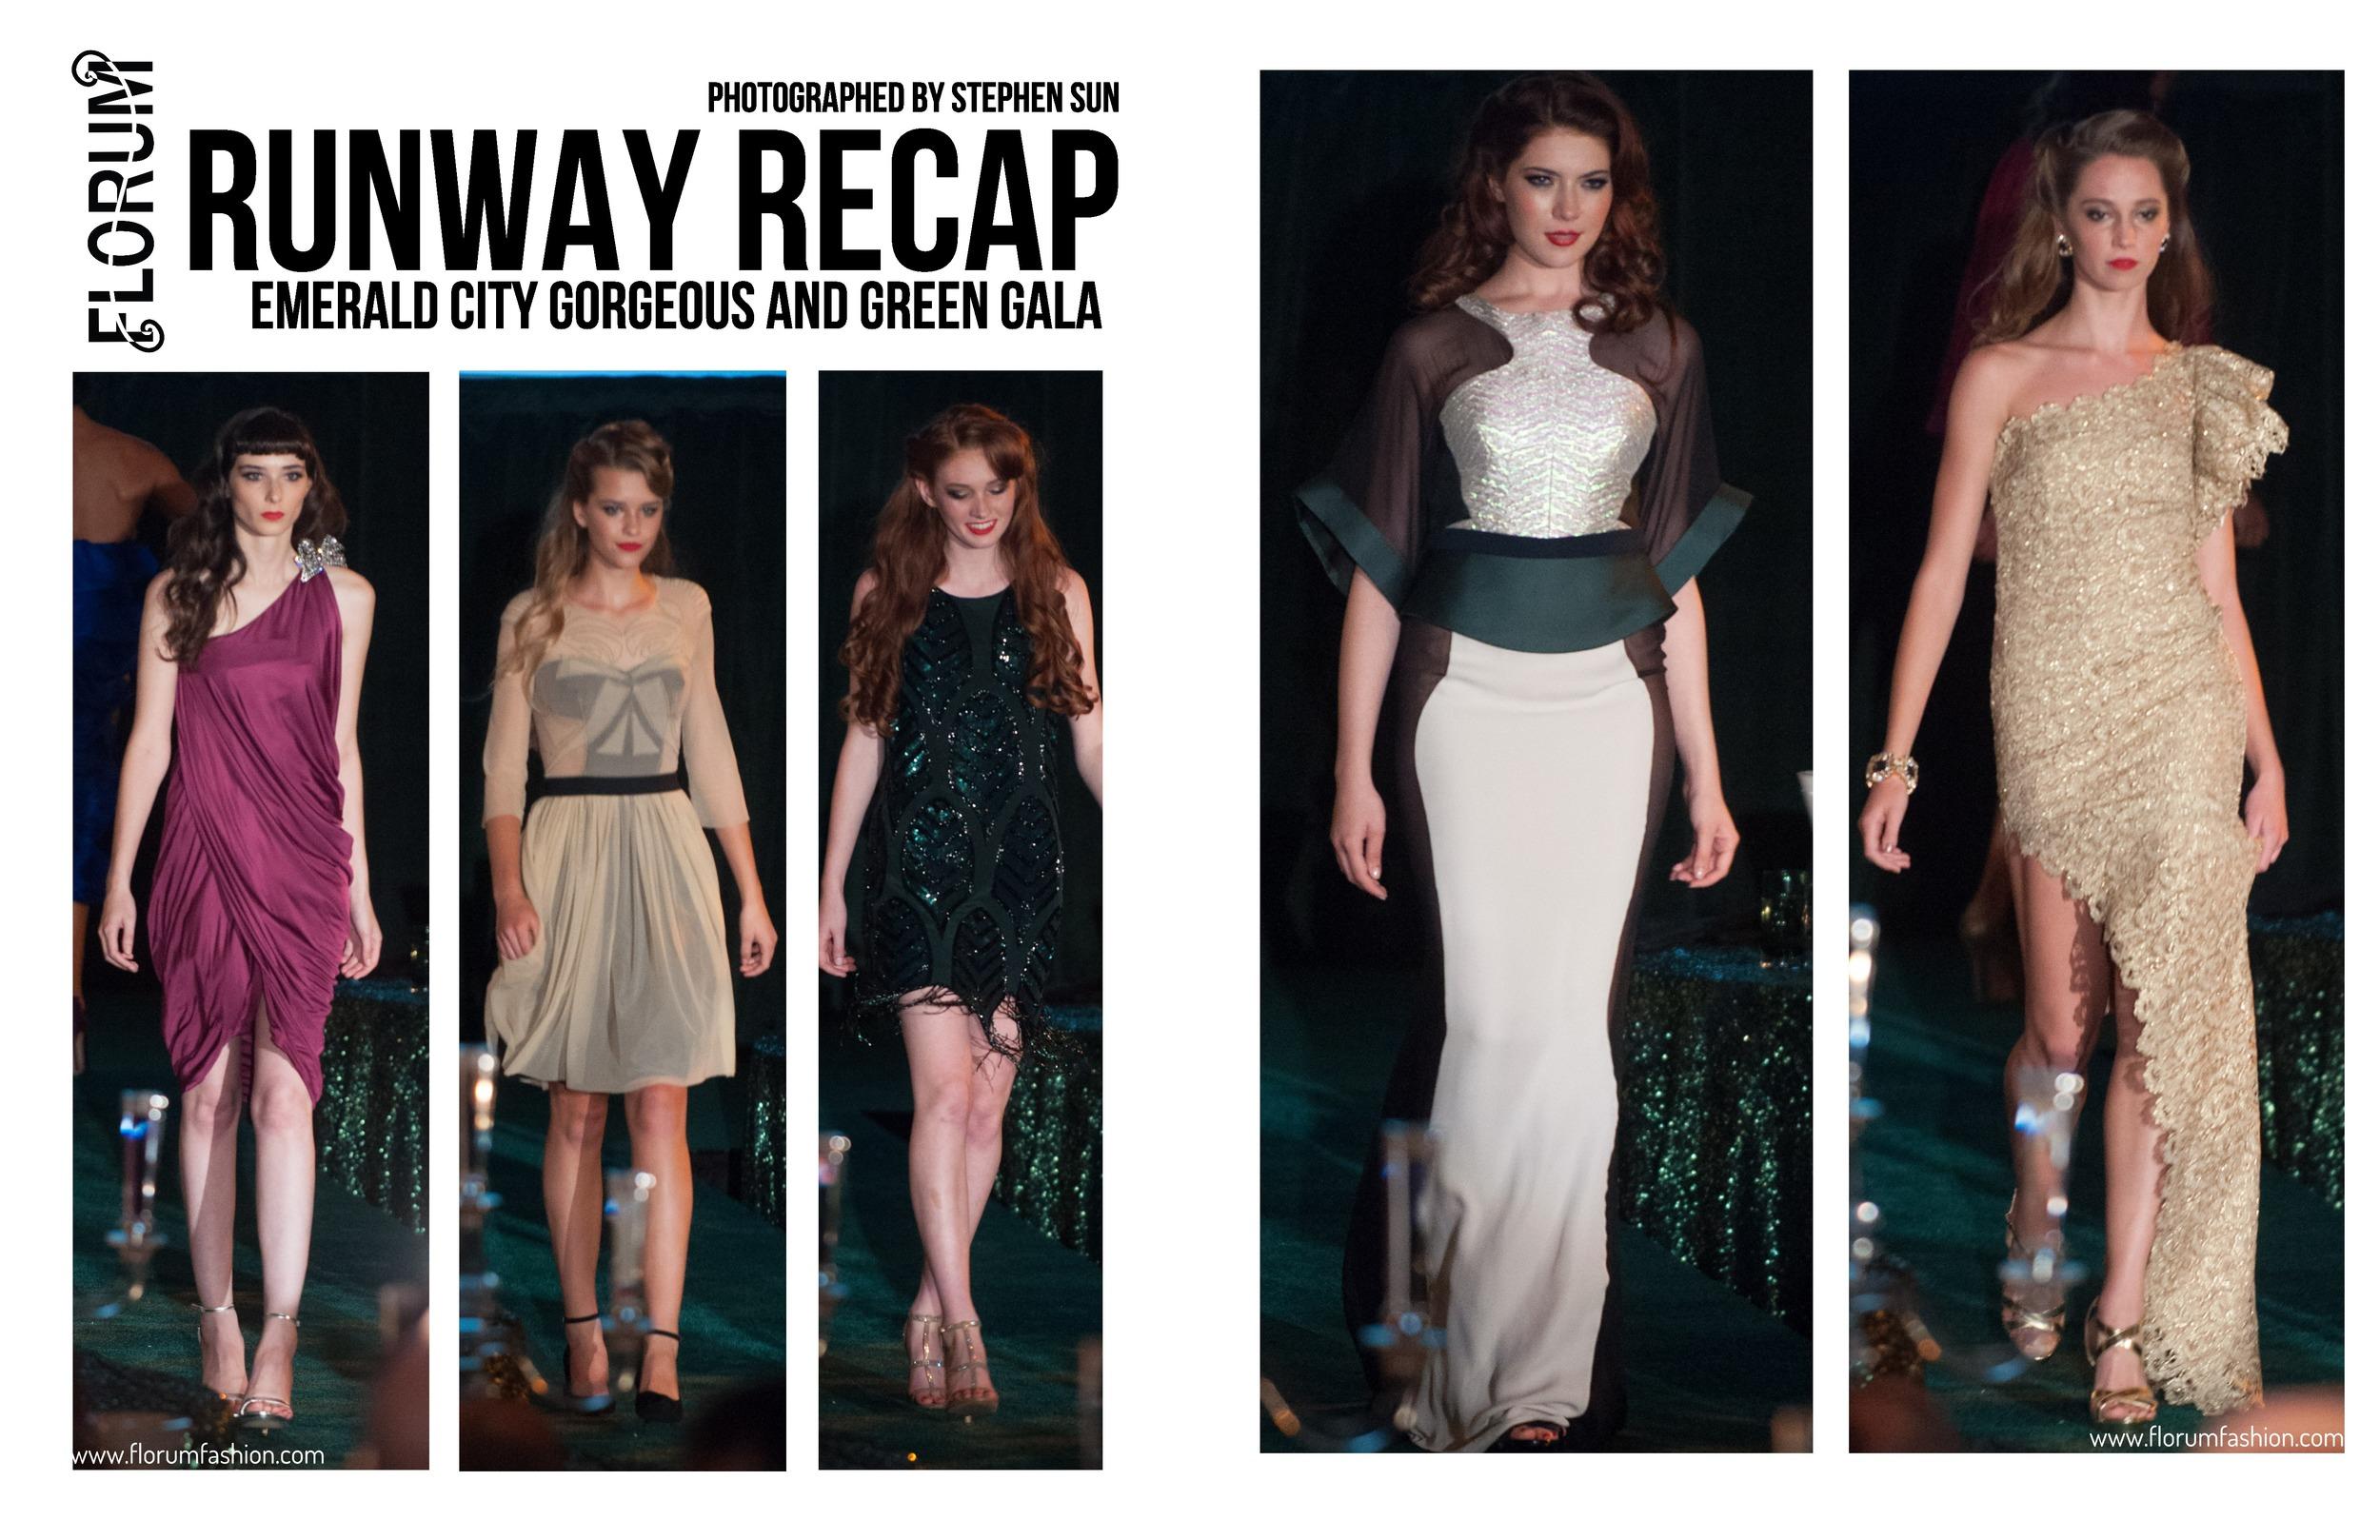 Runway Recap Emerald City Gorgeours and Green Gala Emily Matheny Stars Model Management Florum Fashion Magazine Alyssa Moore